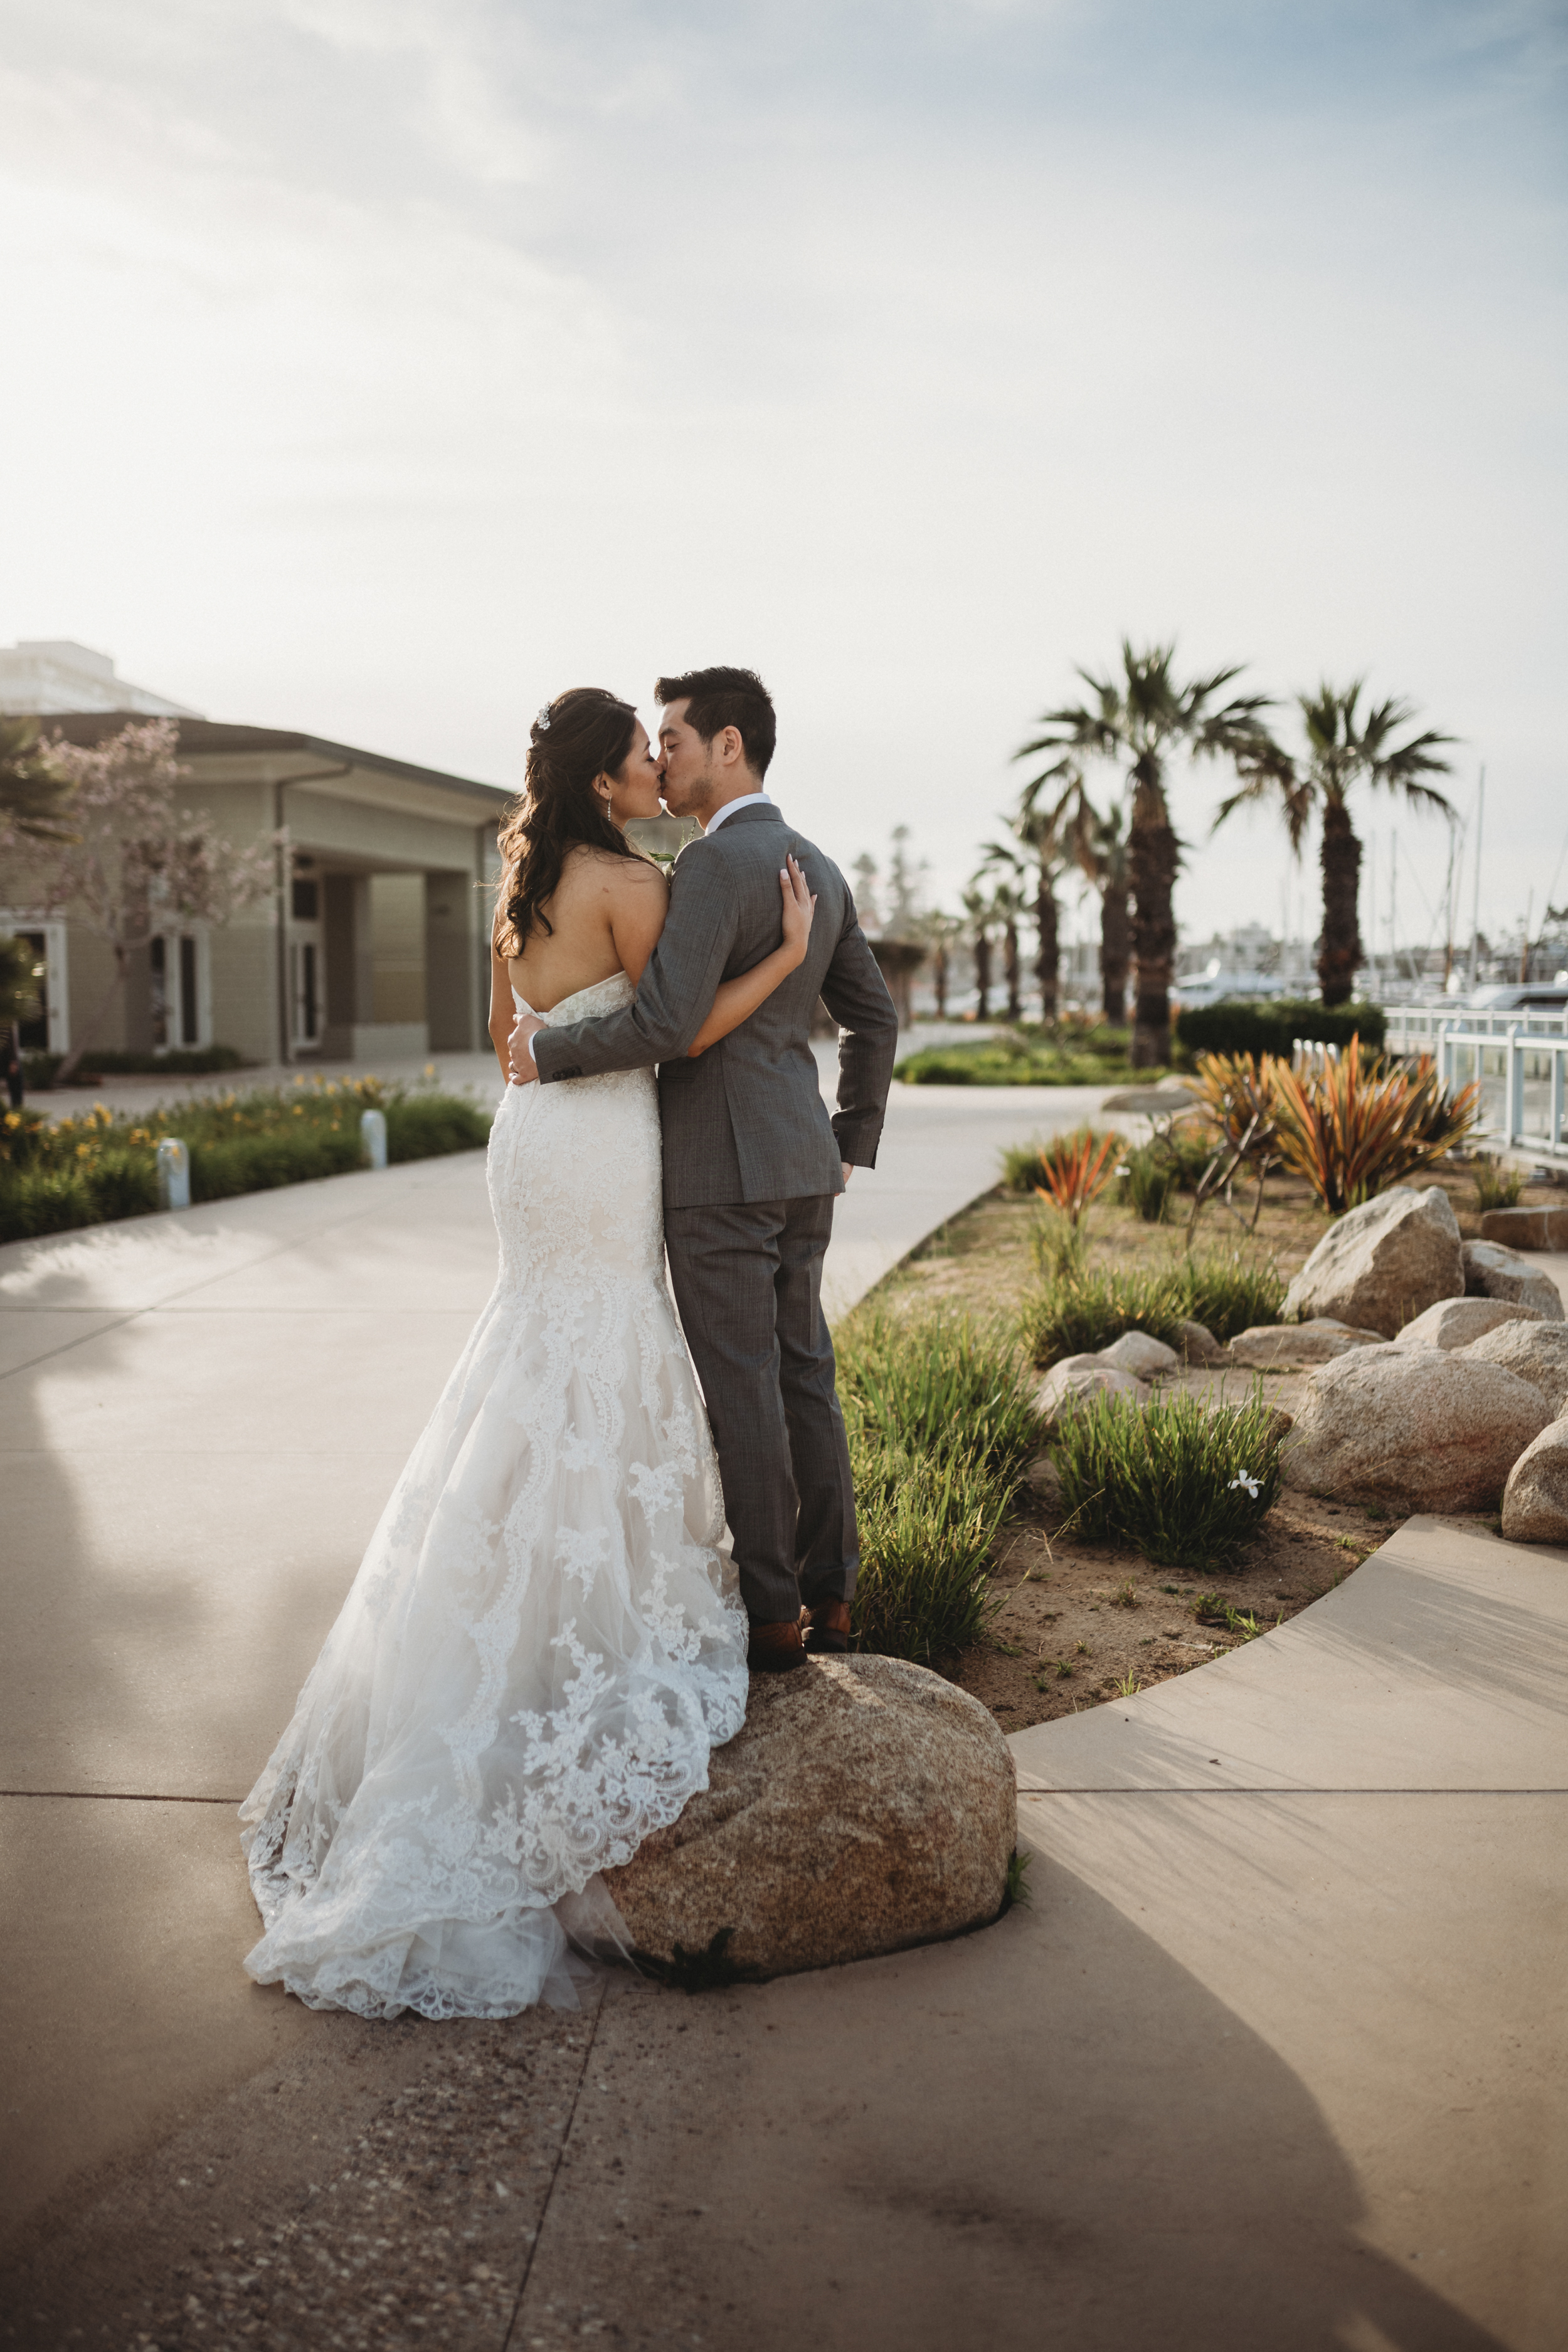 wedding_coronado_community_center-28.jpg